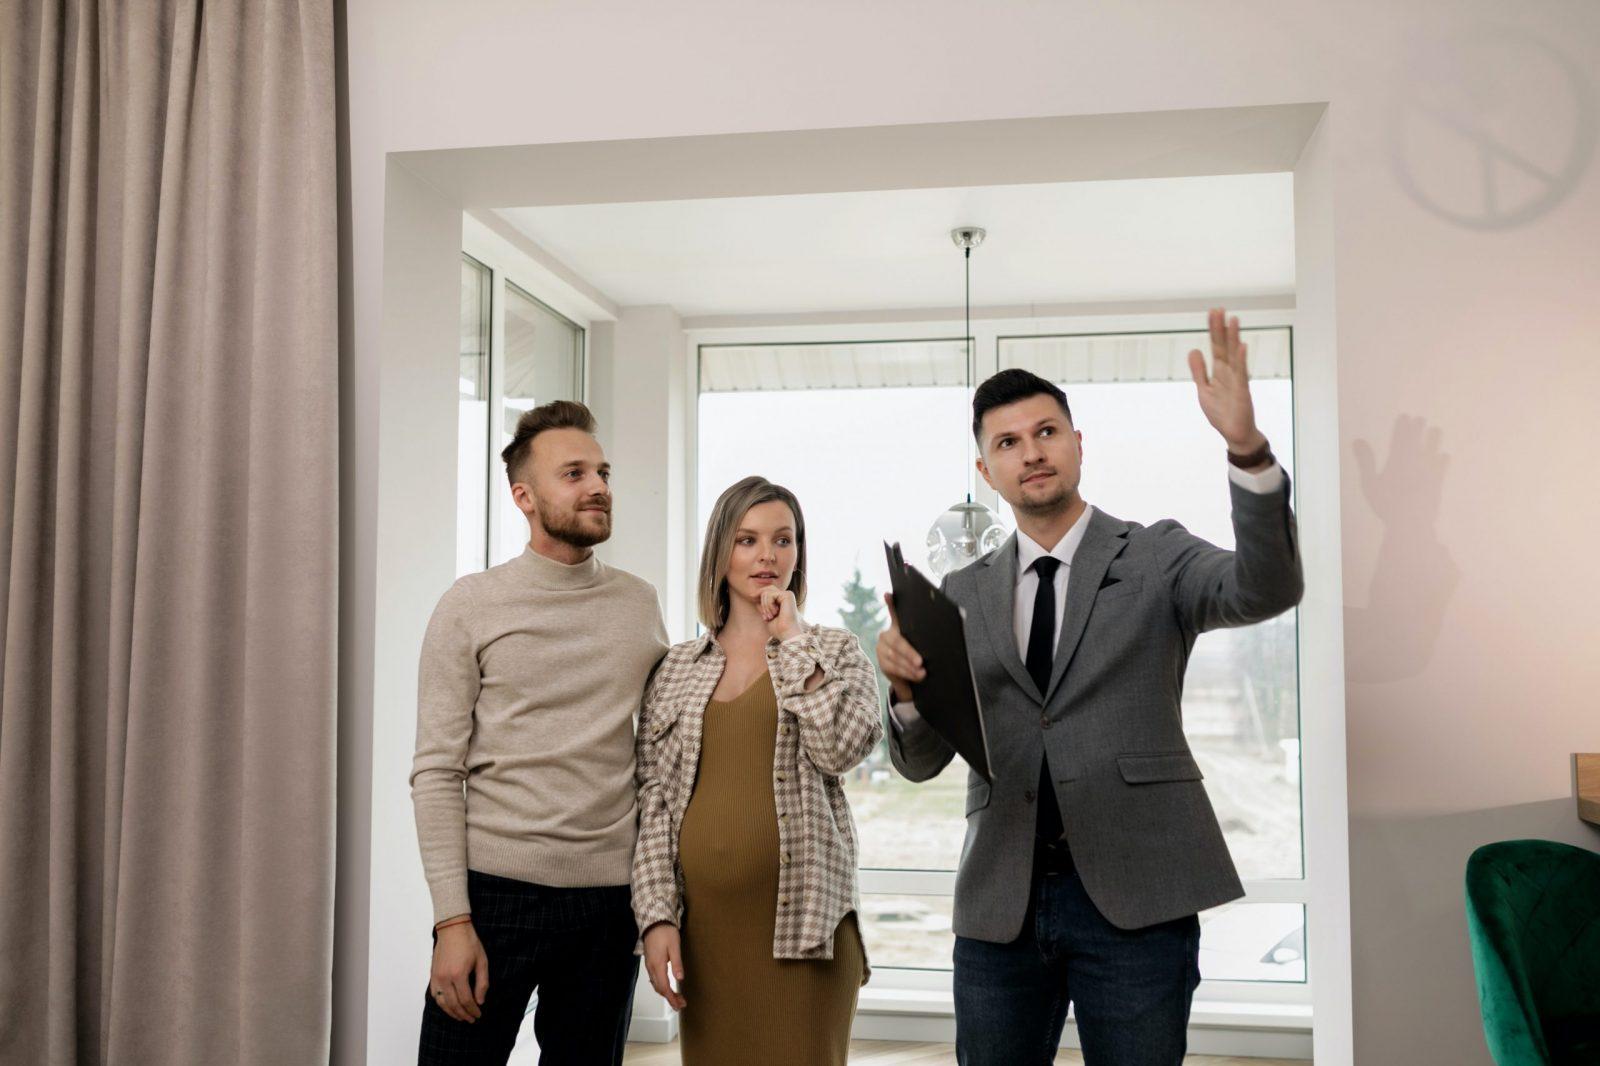 Instagram marketing for real estate agents